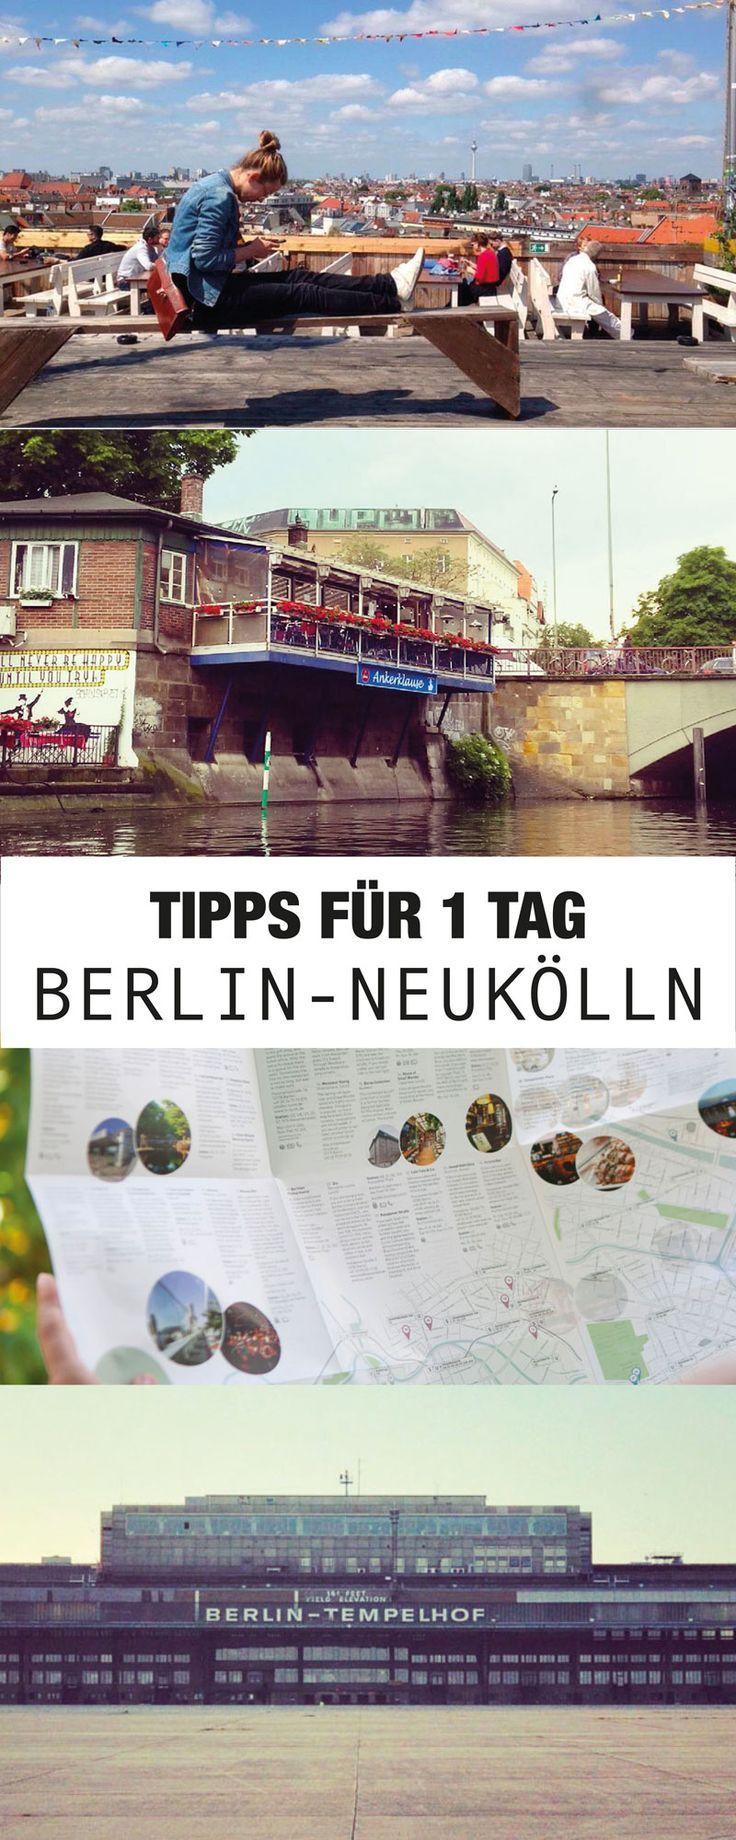 Berlin neukölln tipps für den neunen szenekiez in der hauptstadt